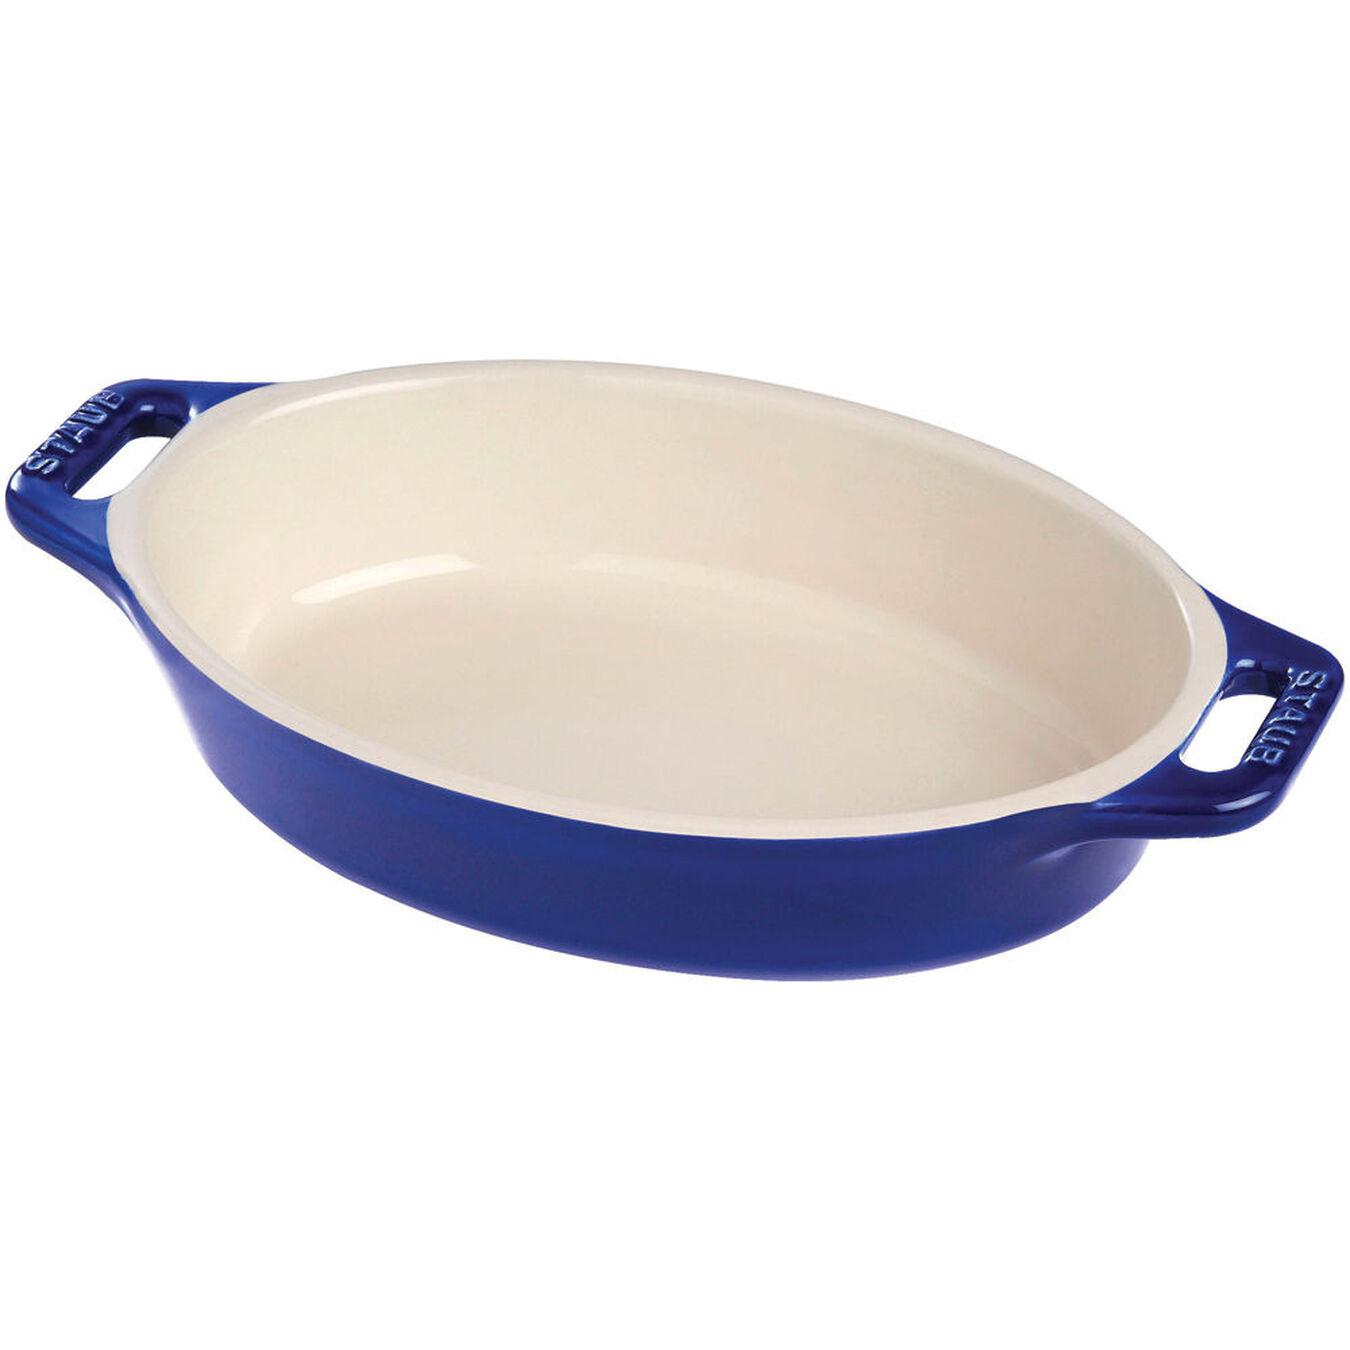 14.5-inch Oval Baking Dish - Dark Blue,,large 1